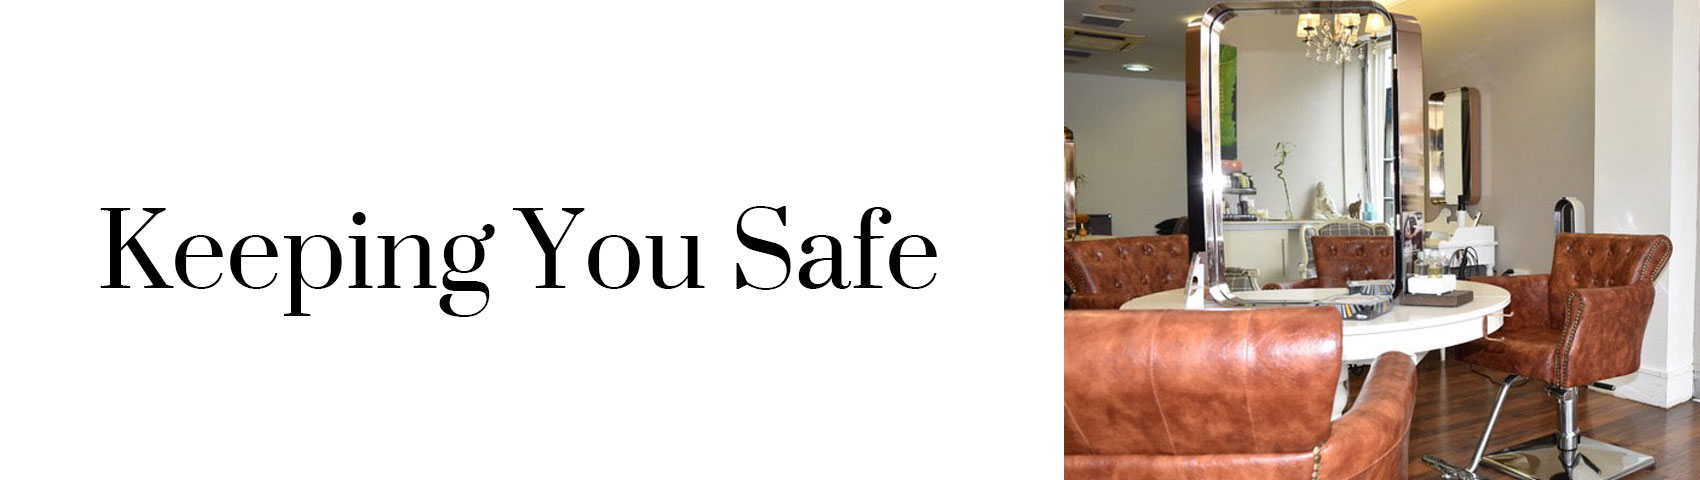 Keeping You Safe inner banner 2